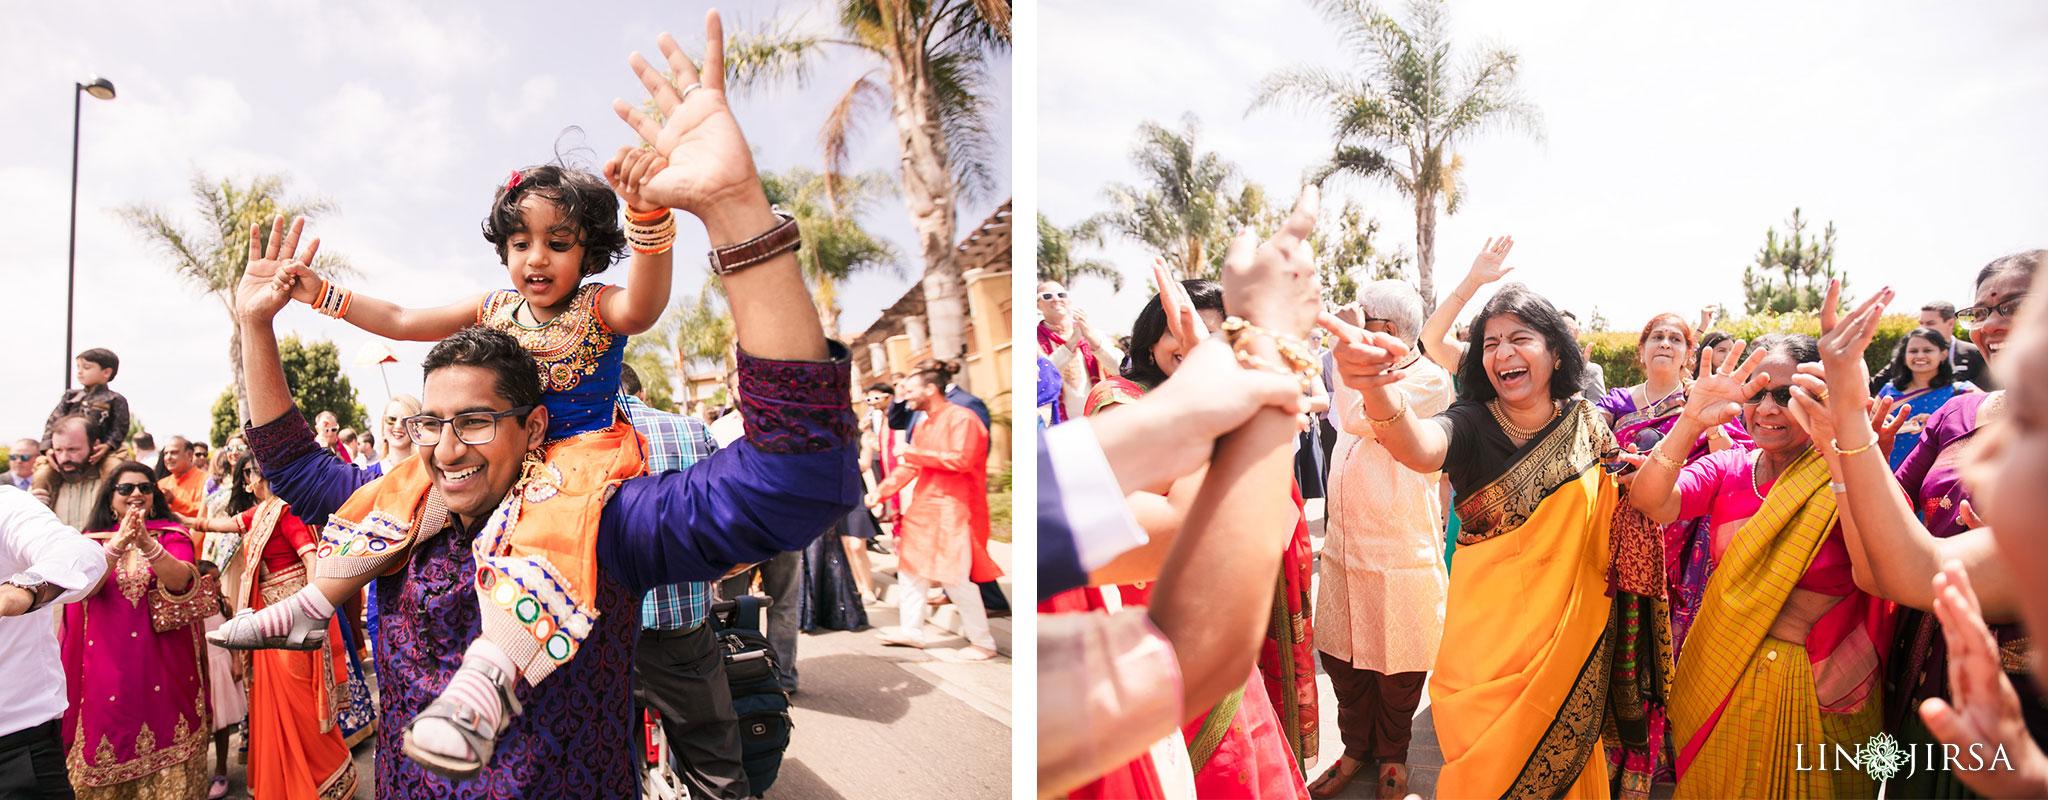 19 sheraton carlsbad resort indian wedding photography